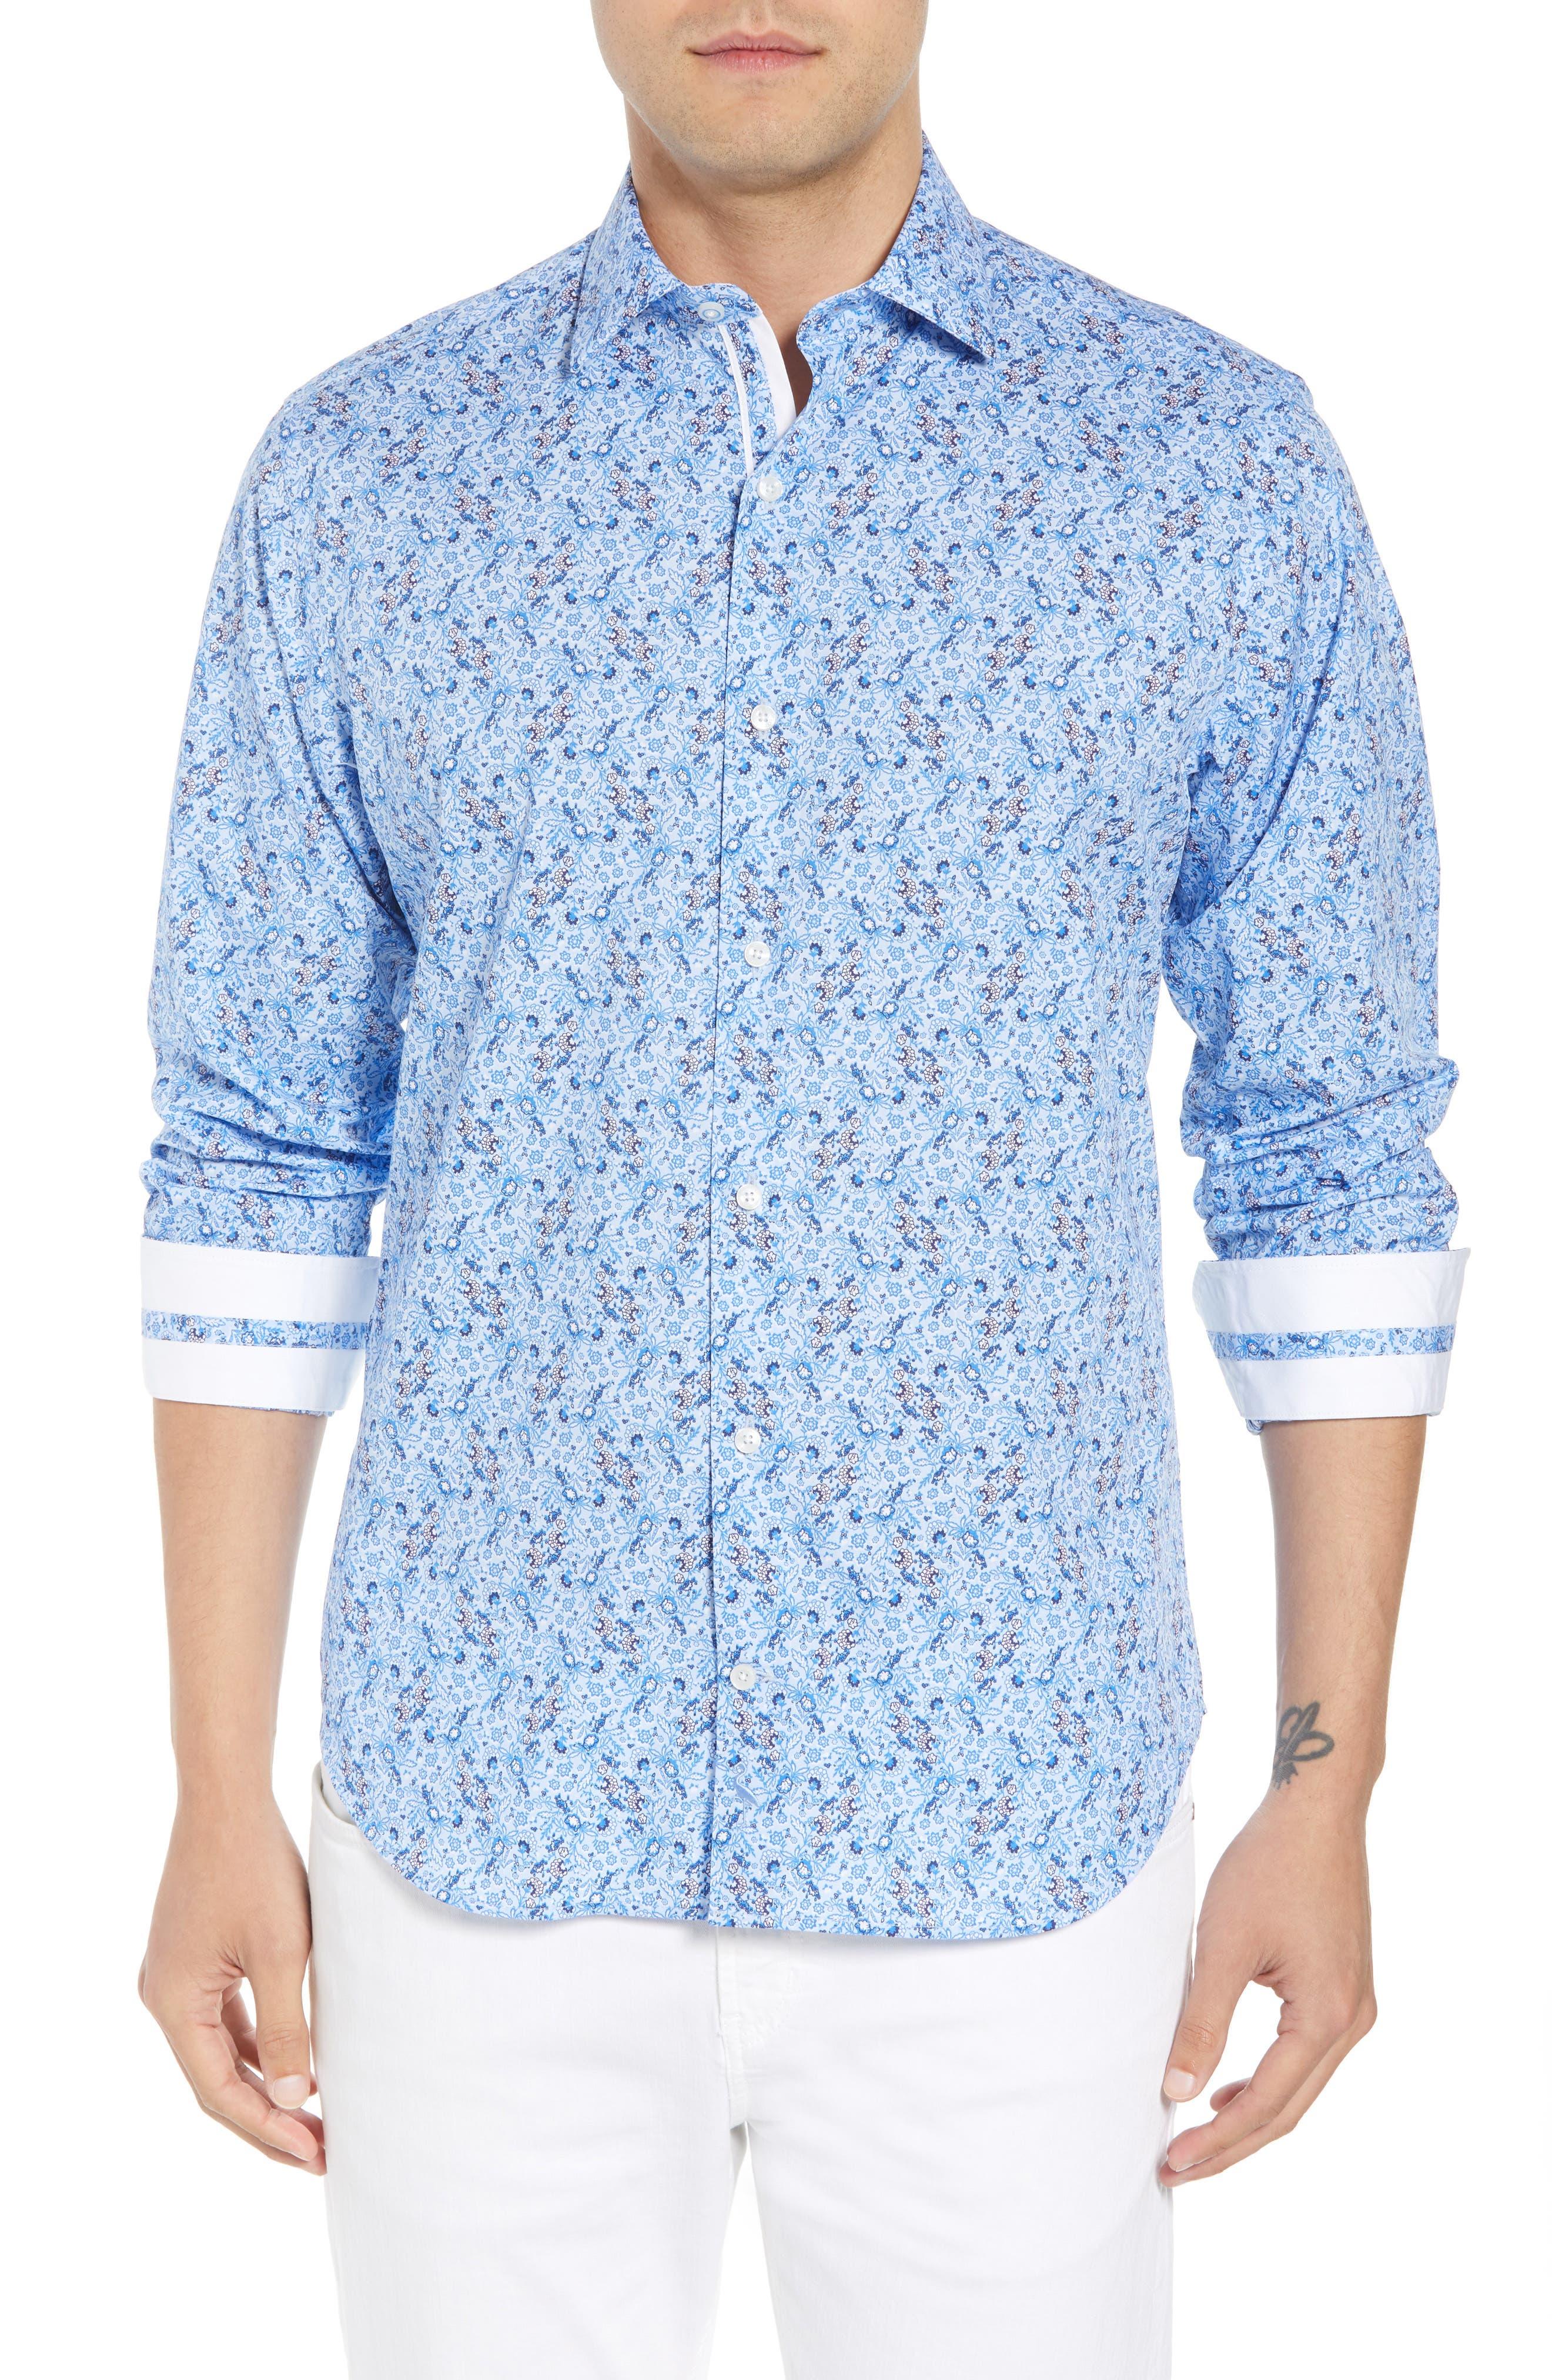 Stewart Regular Fit Floral Sport Shirt,                             Main thumbnail 1, color,                             400